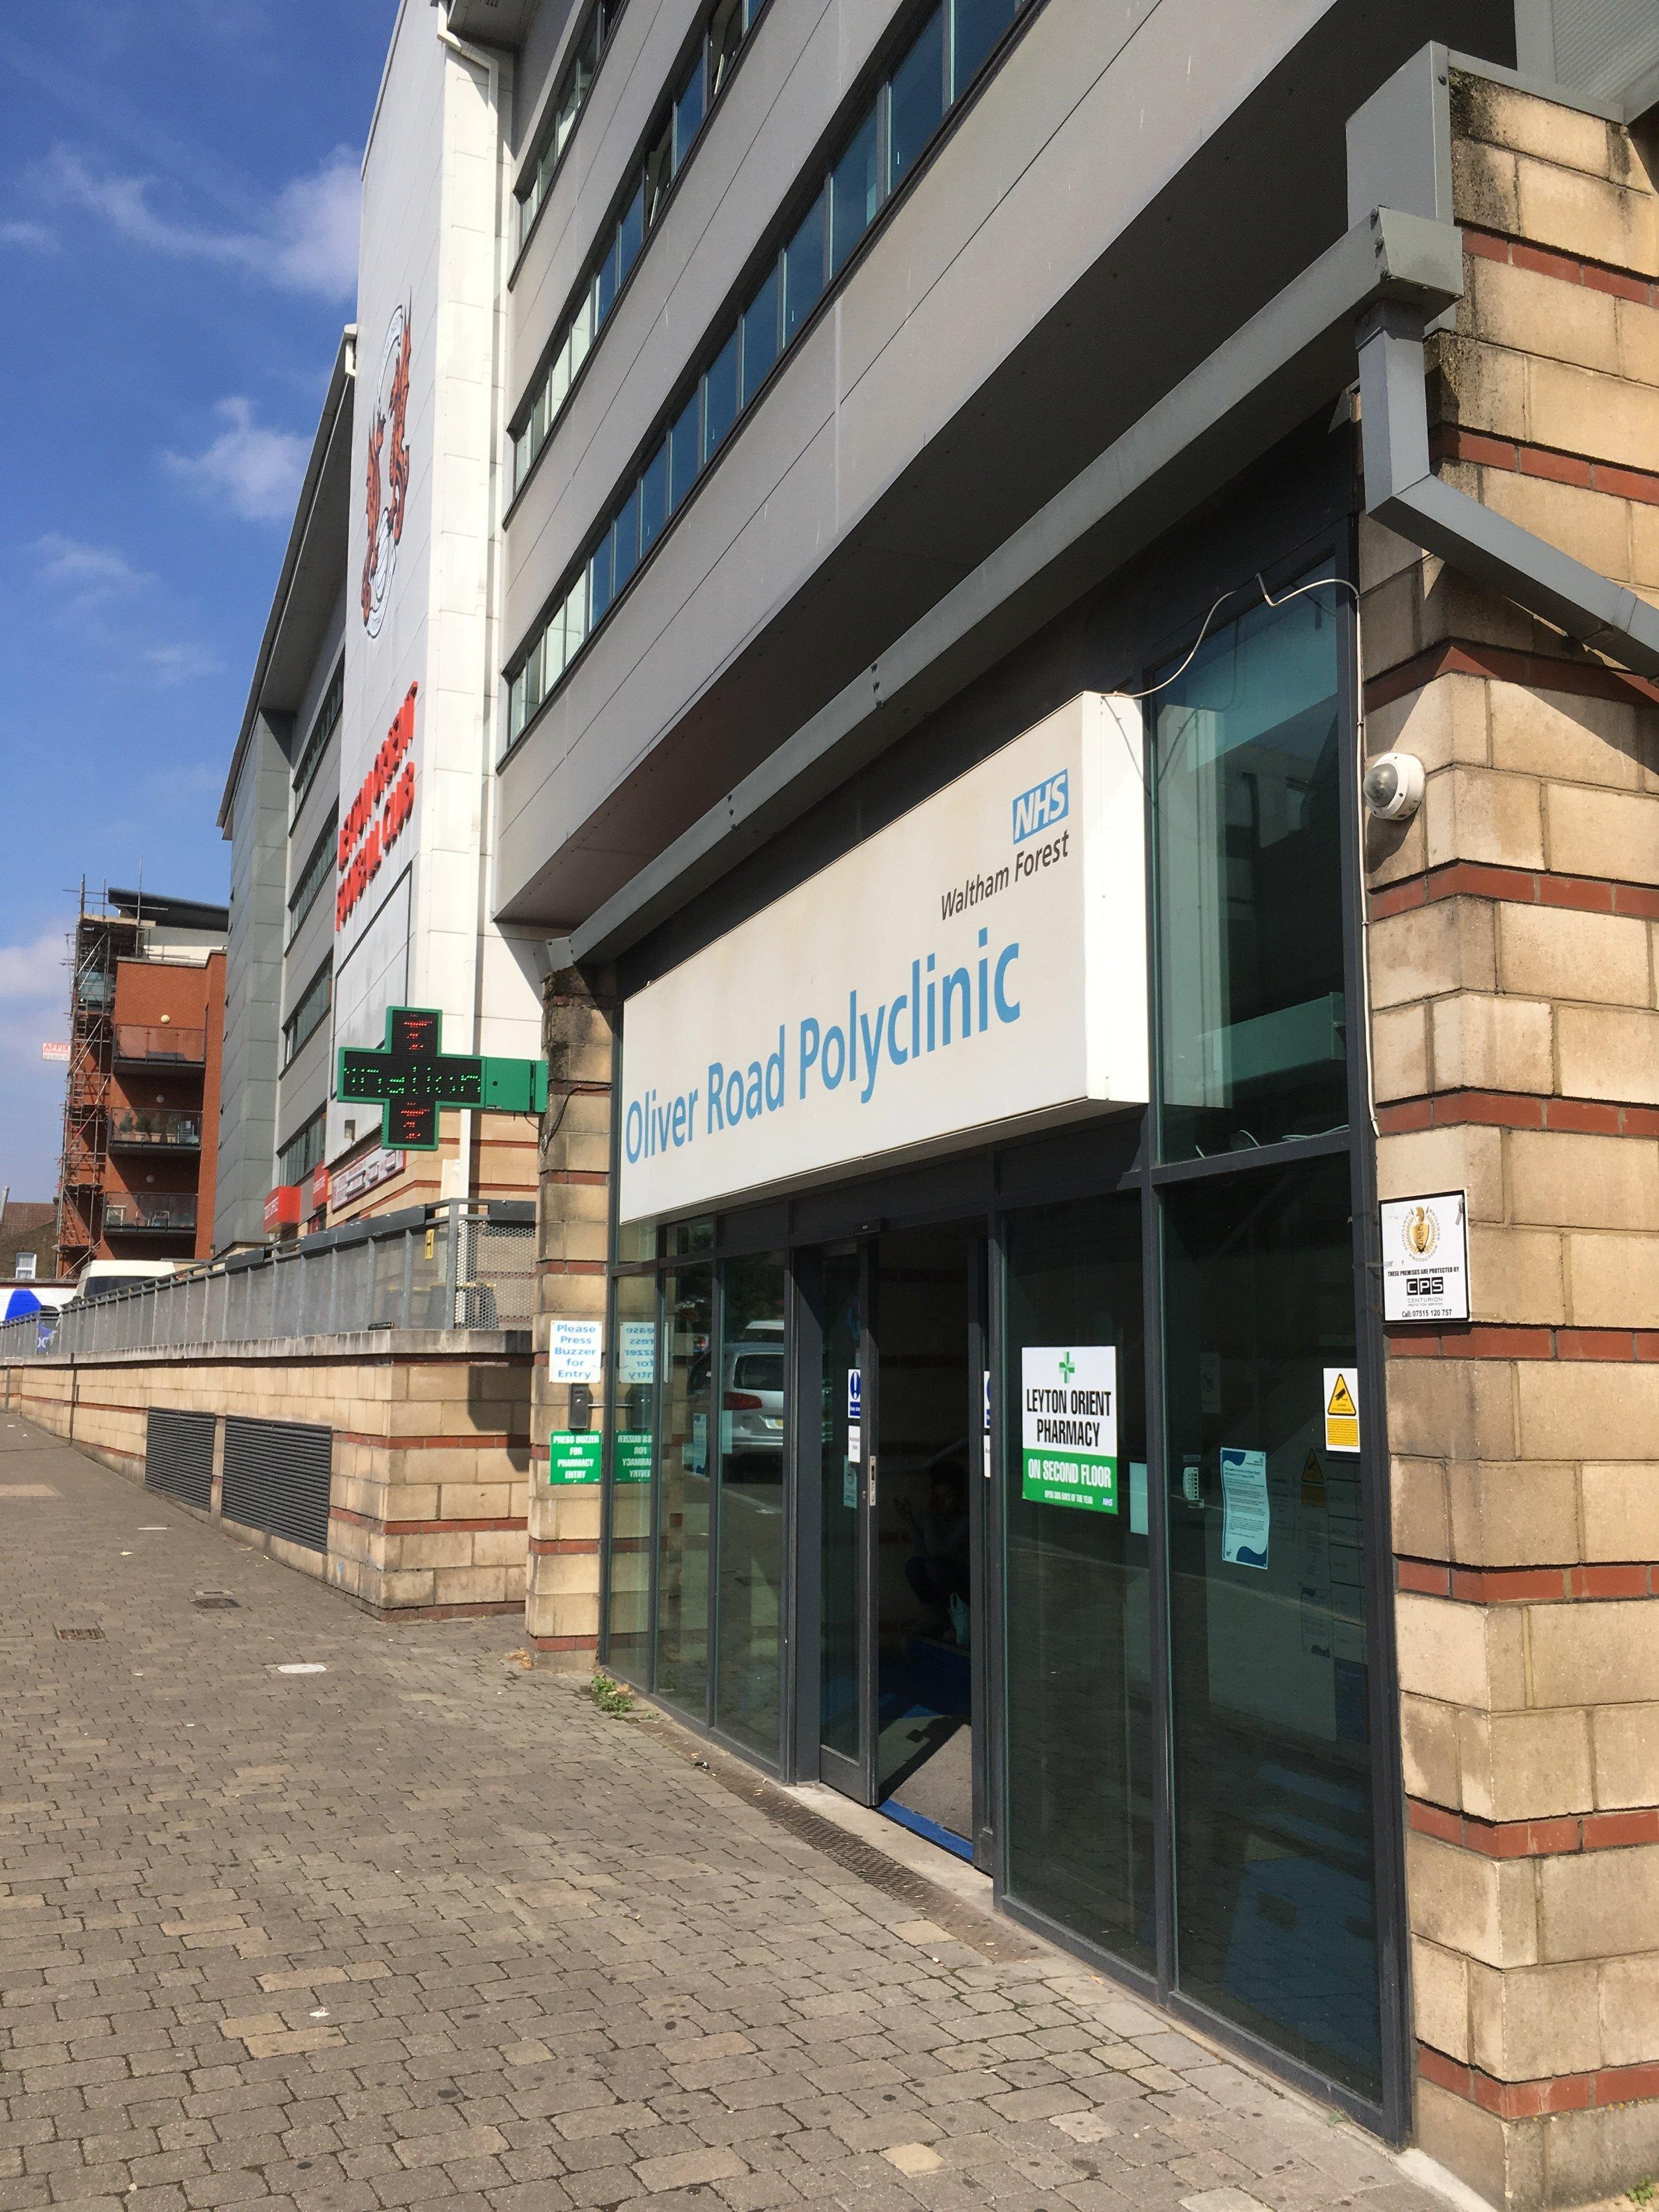 Oliver Road Polyclinic, Leyton Healthcare, 4th Floor, London